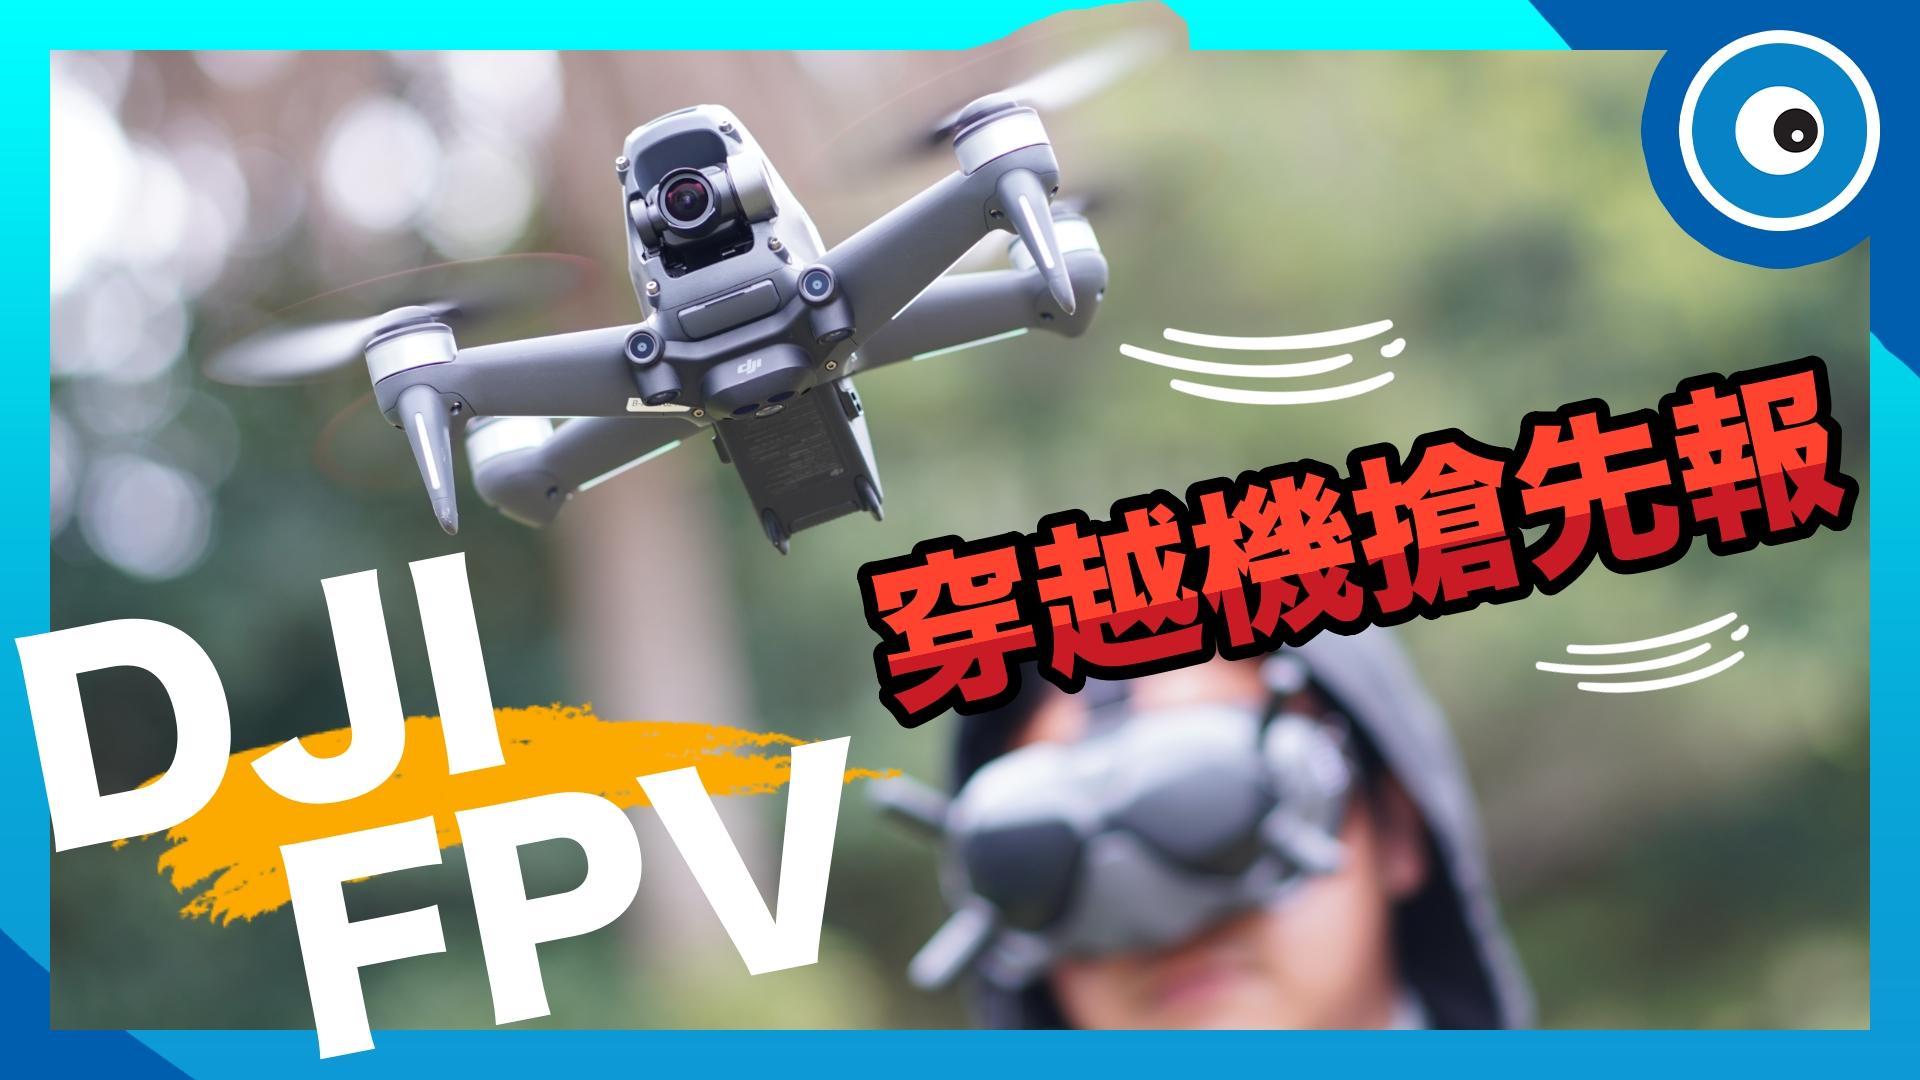 DJI FPV 正式在台灣上市了,這款大疆旗下第一款穿越機具備 140km/h 最高速度、0-100km/h 加速僅需兩秒、4K 60fps 錄影